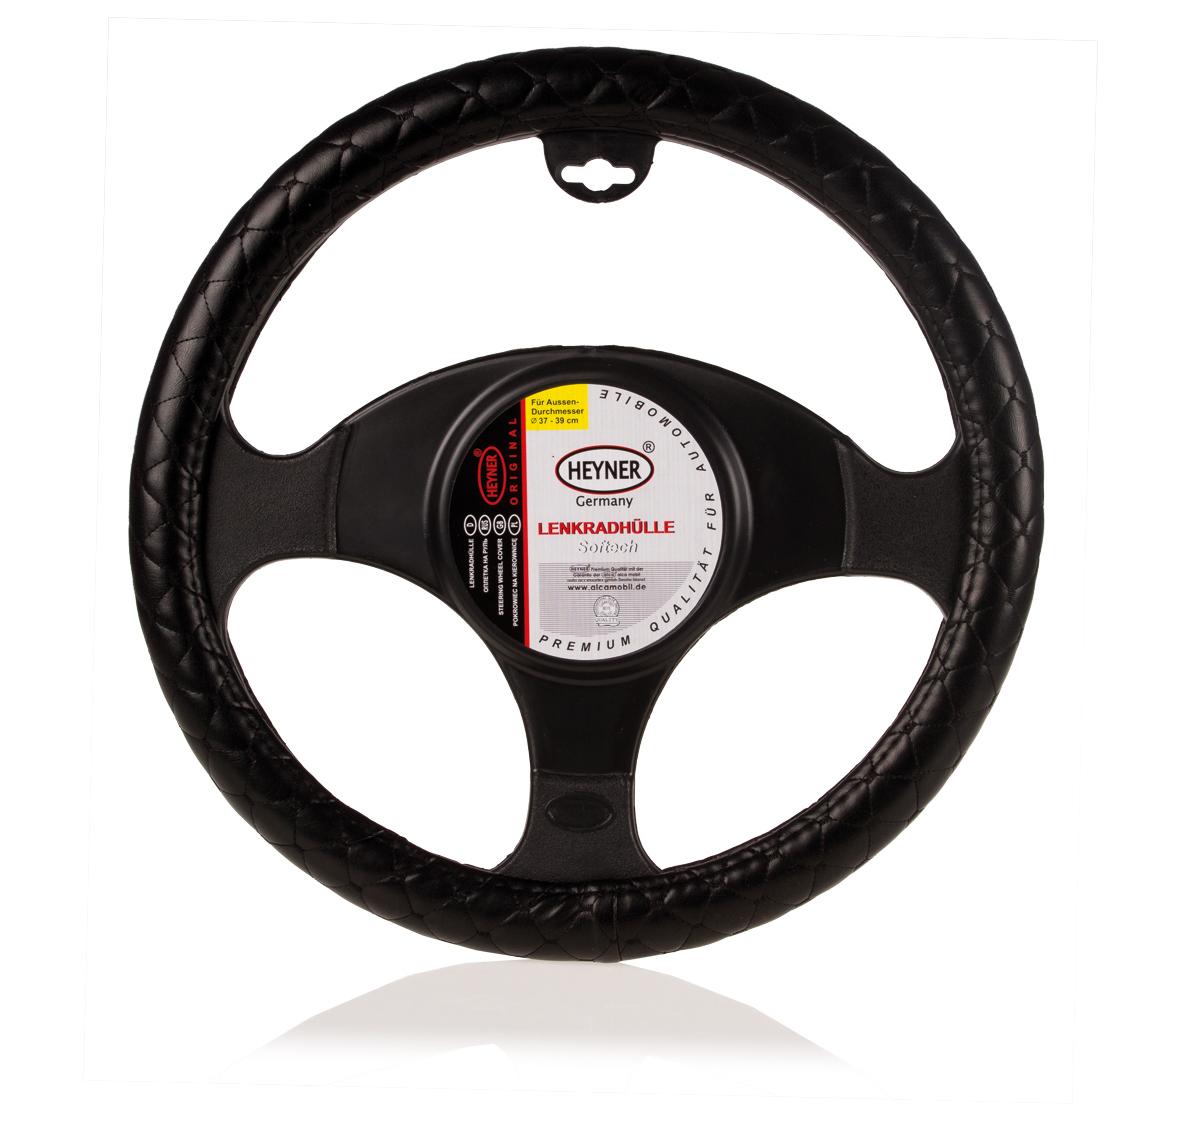 Чехол на руль Heyner, натуральная кожа, цвет: черный, диаметр 37-39 см